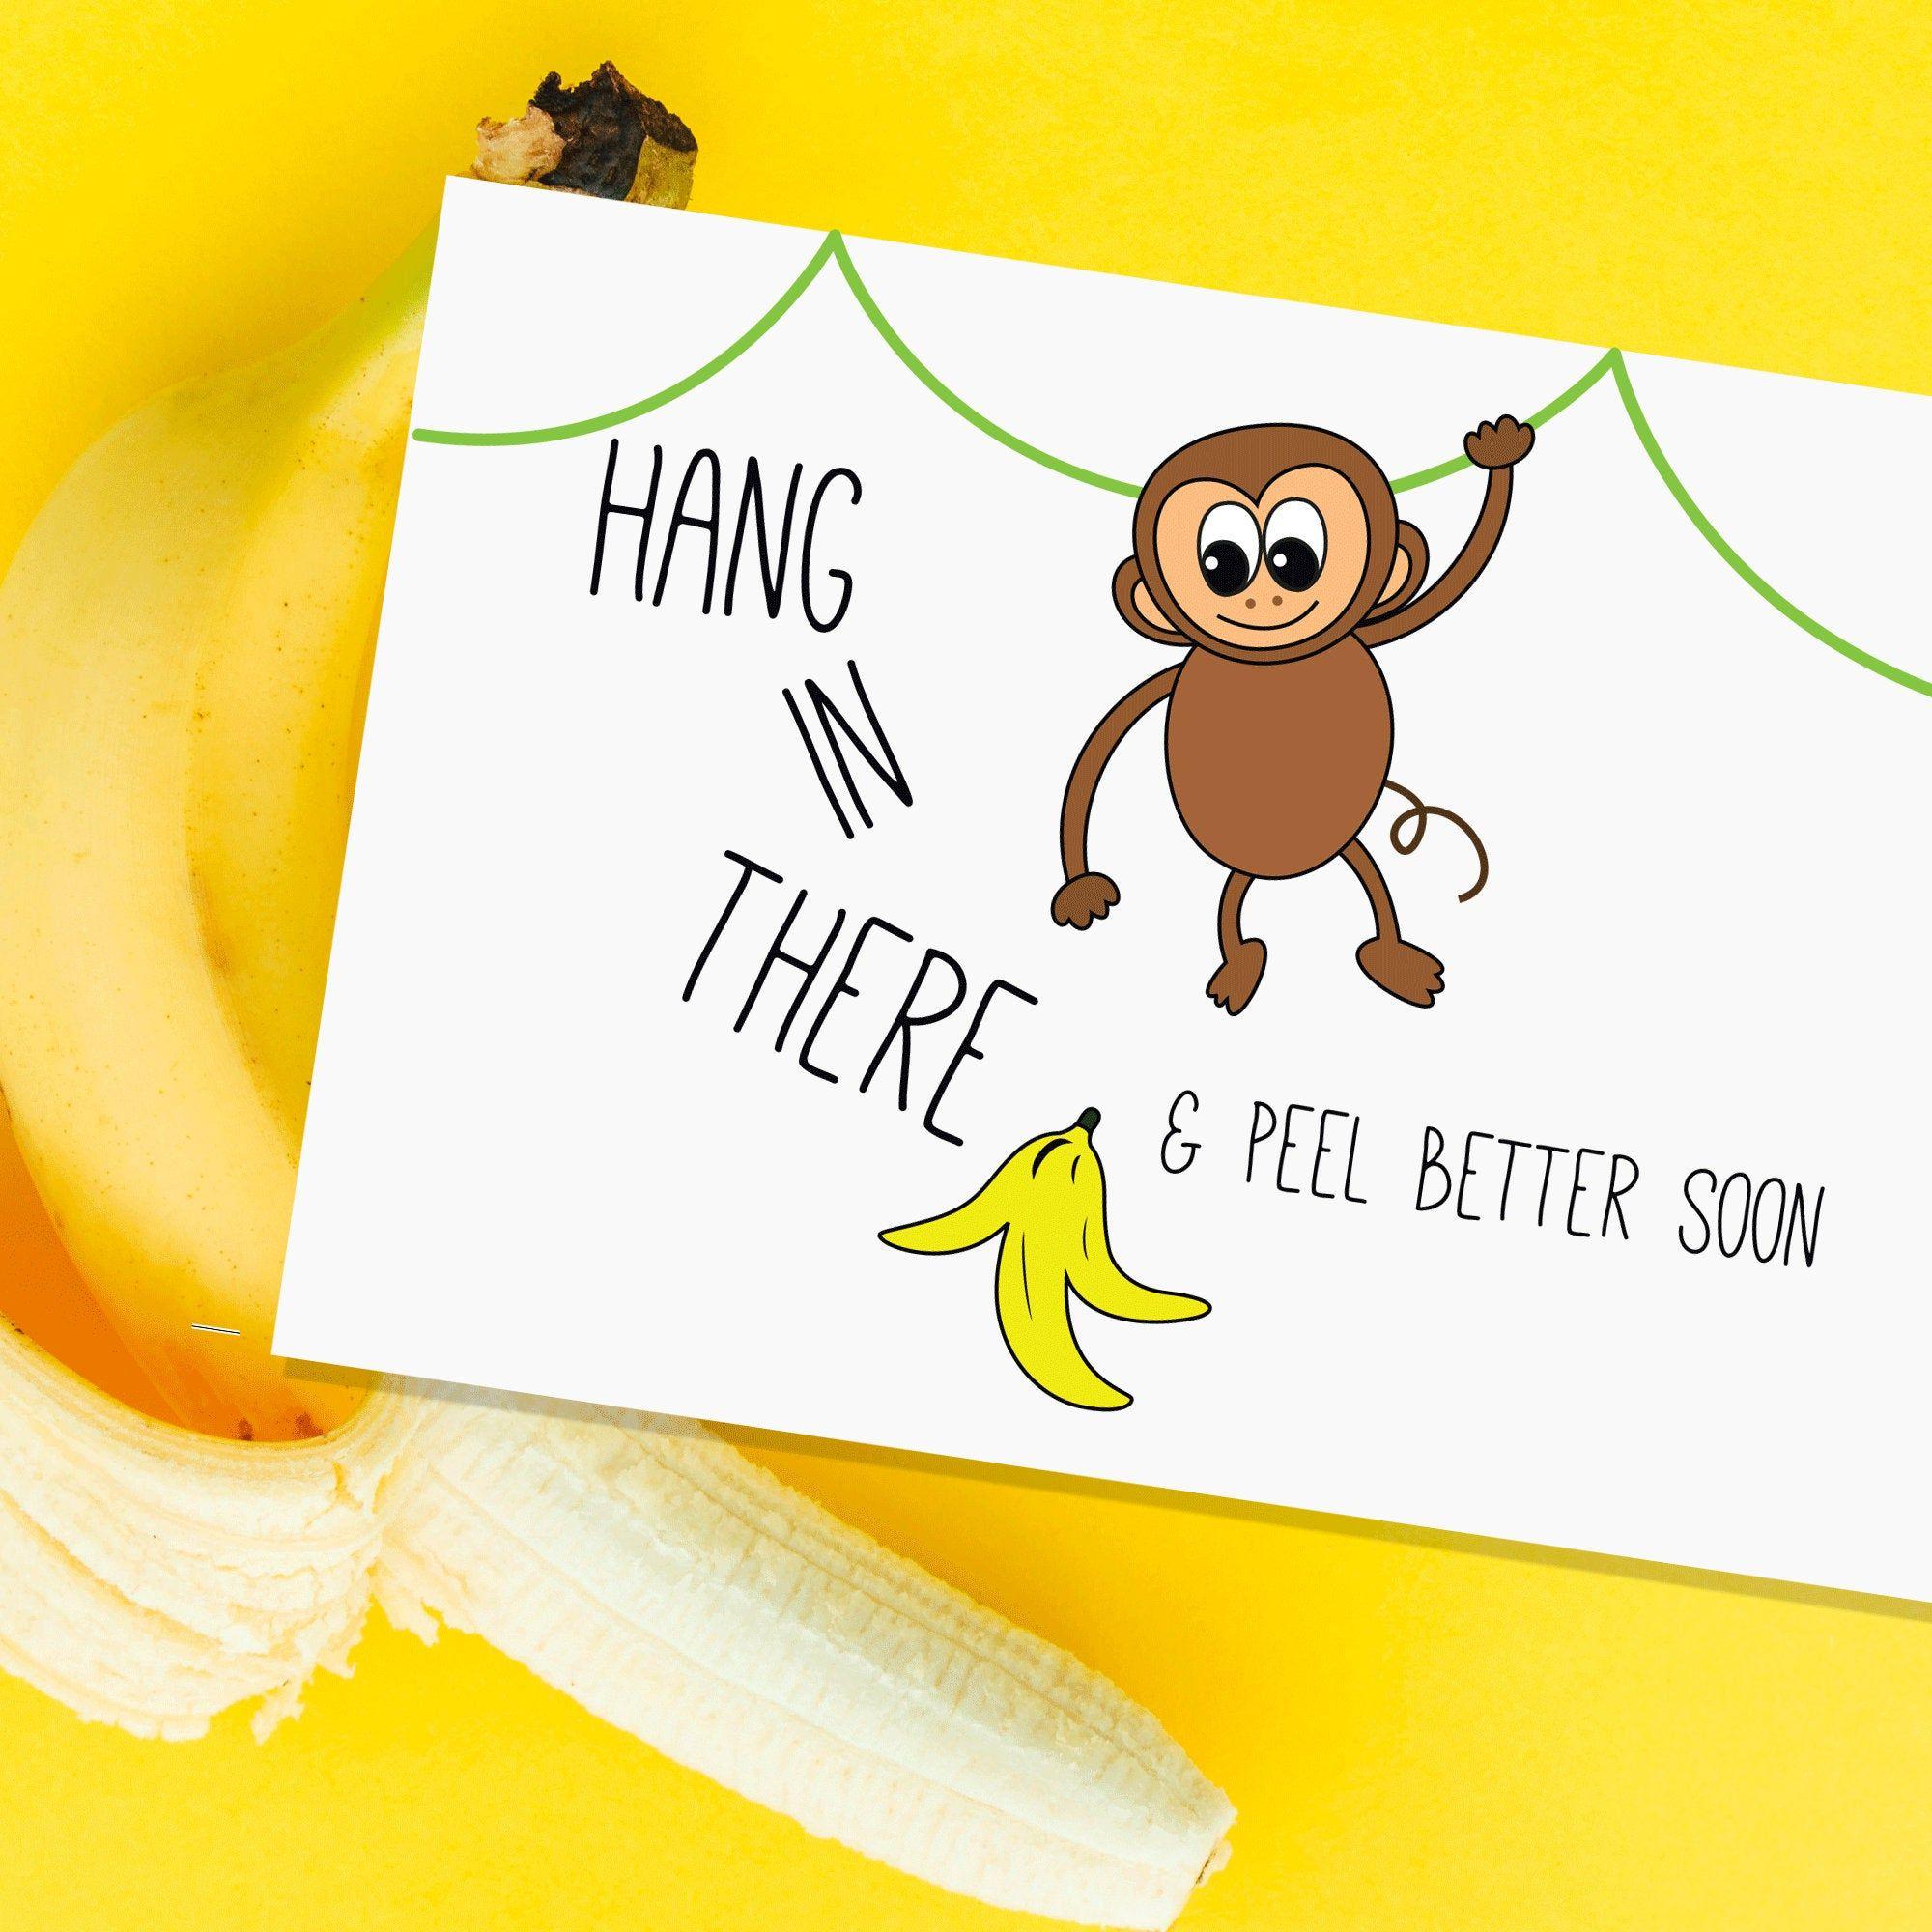 Get Well Soon Monkey Greeting Card Cute Thank You Cards Get Well Cards Get Well Soon